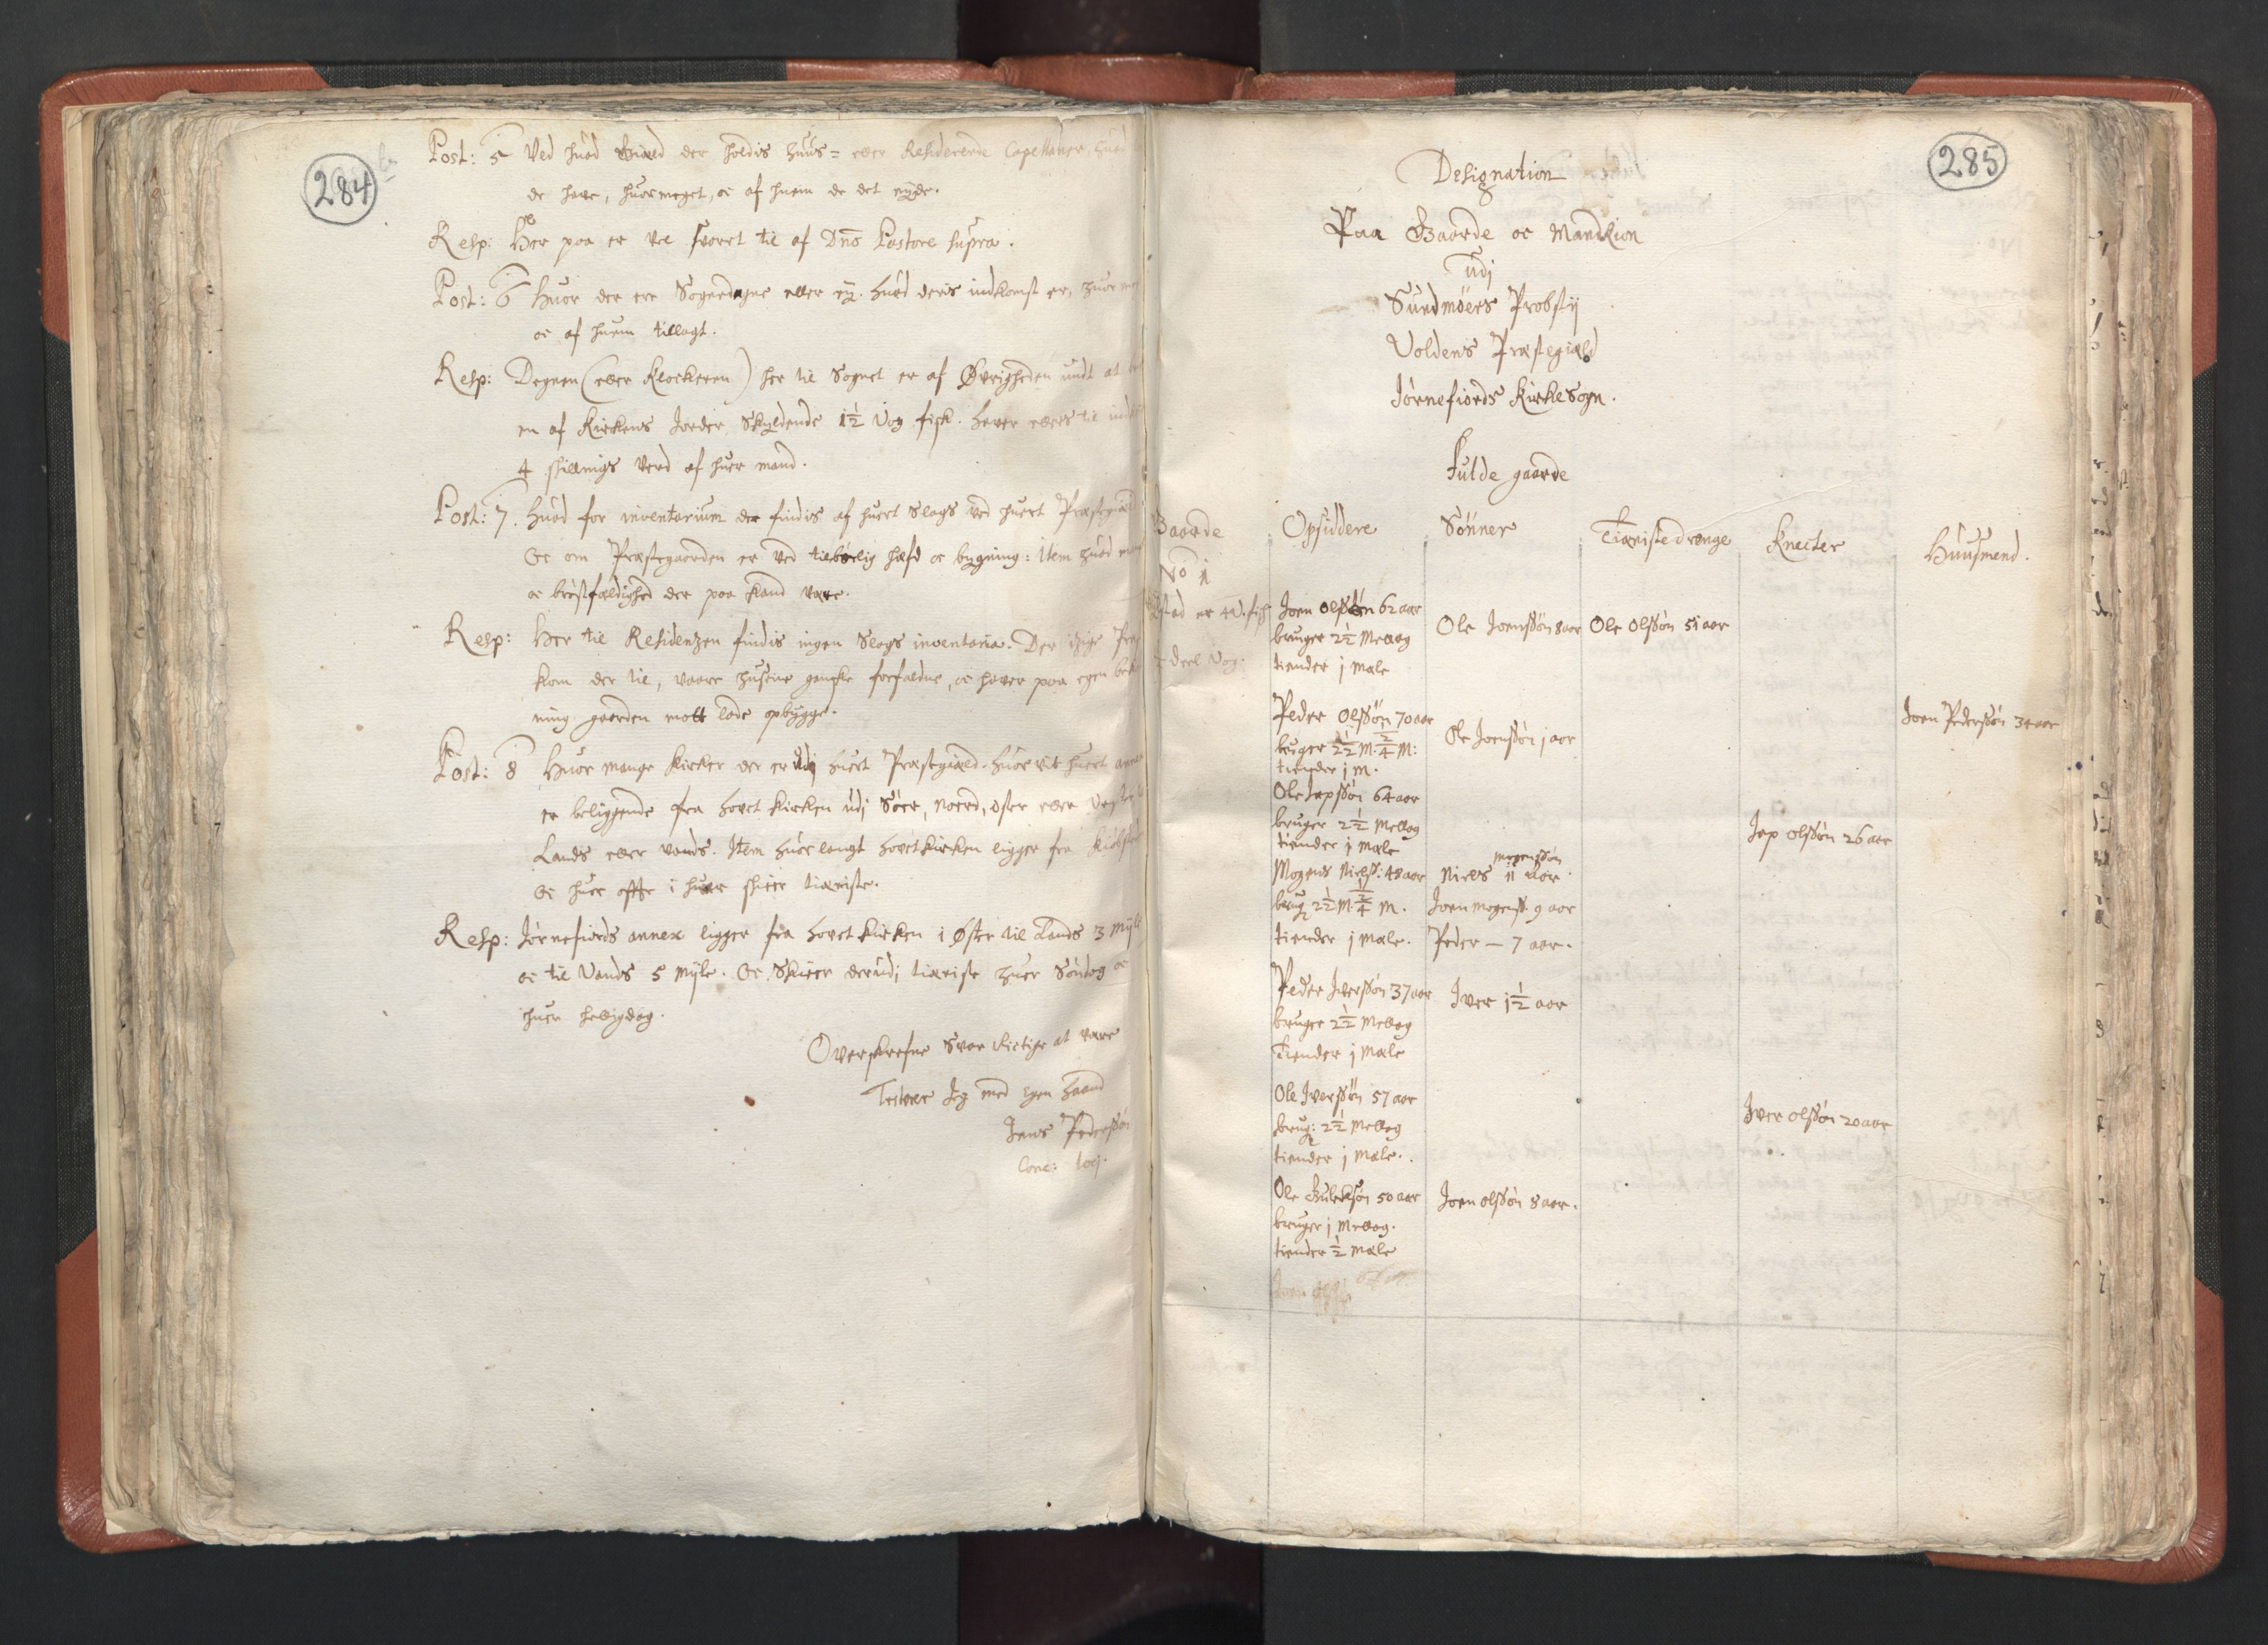 RA, Vicar's Census 1664-1666, no. 26: Sunnmøre deanery, 1664-1666, p. 284-285